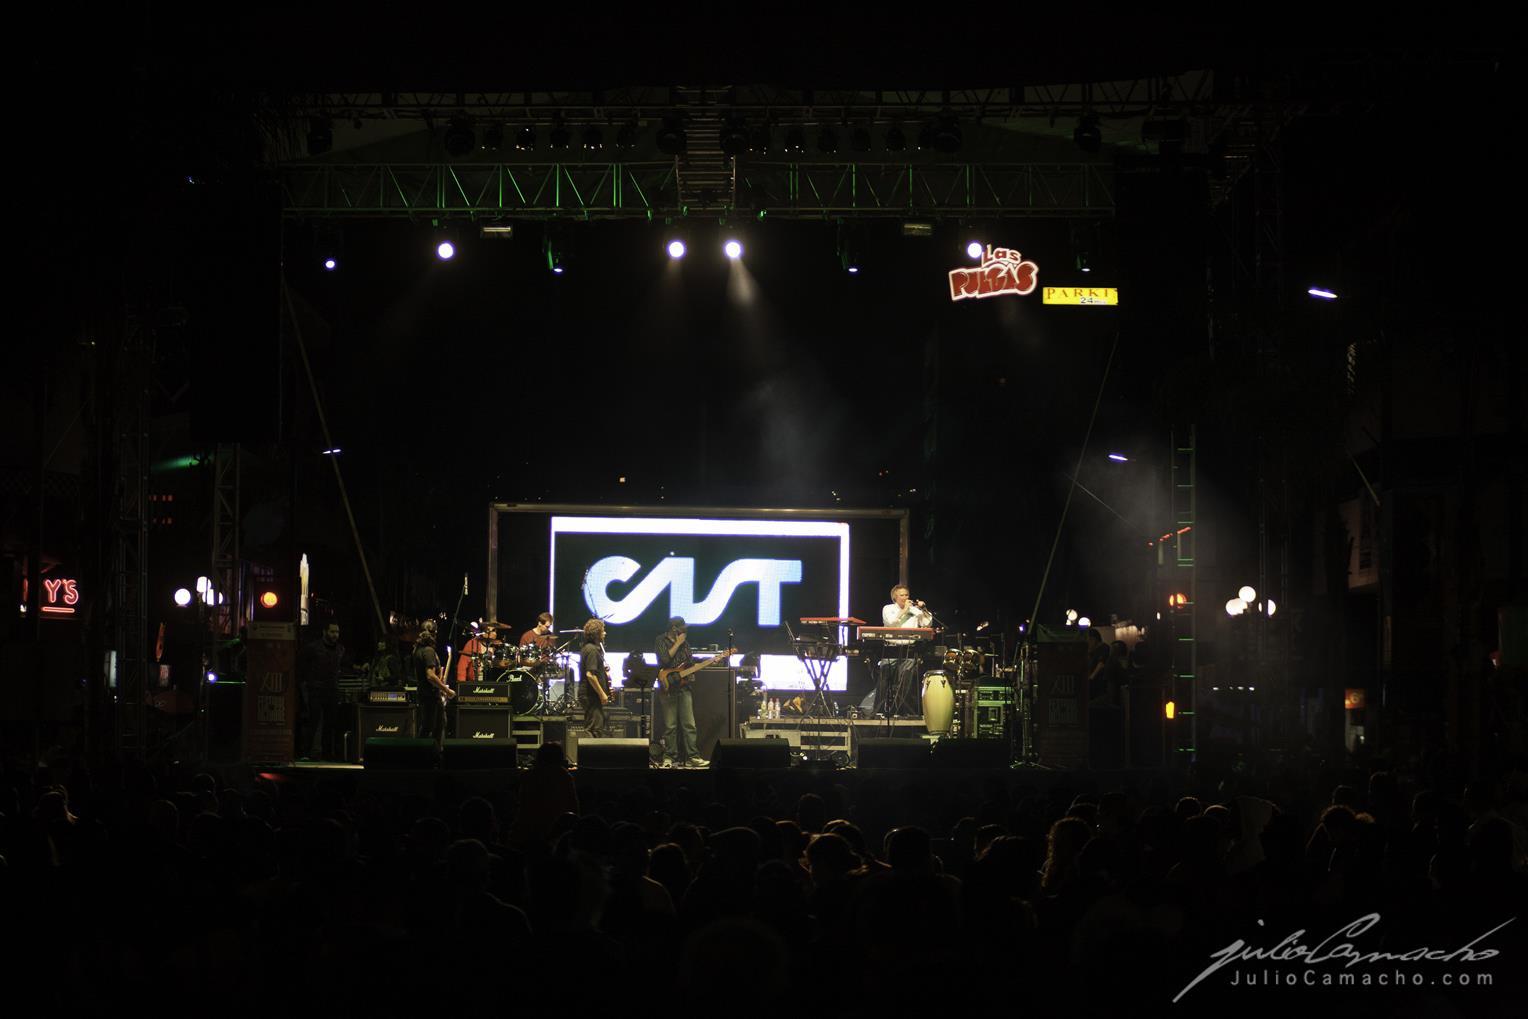 2014-10-30 31 CAST TOUR Ensenada y Tijuana - 1436 - www.Juli (Copy).jpg